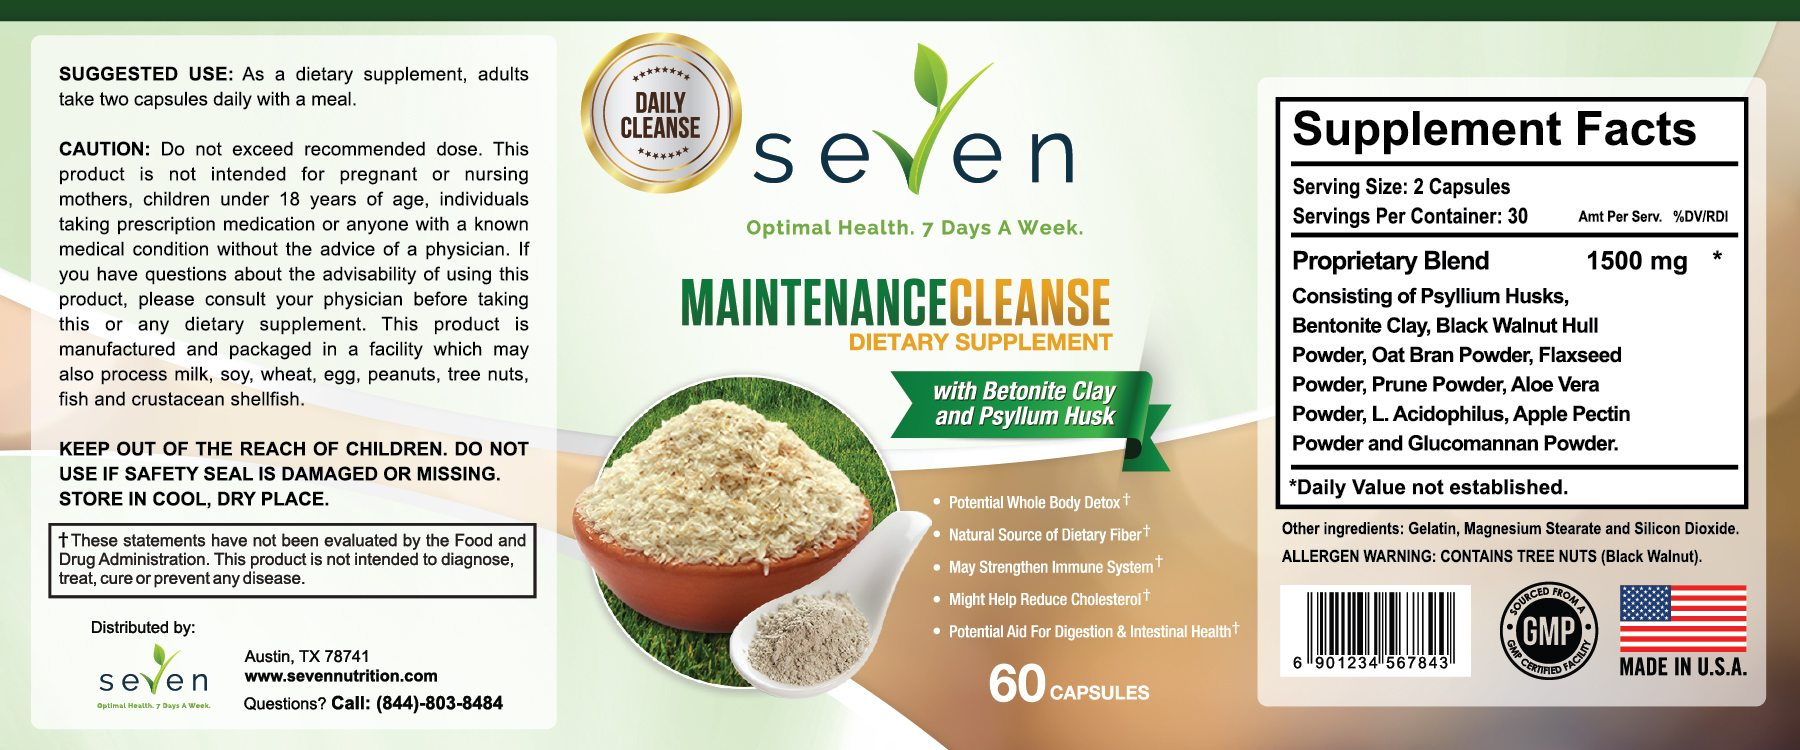 Super Cleanser Supplement Facts